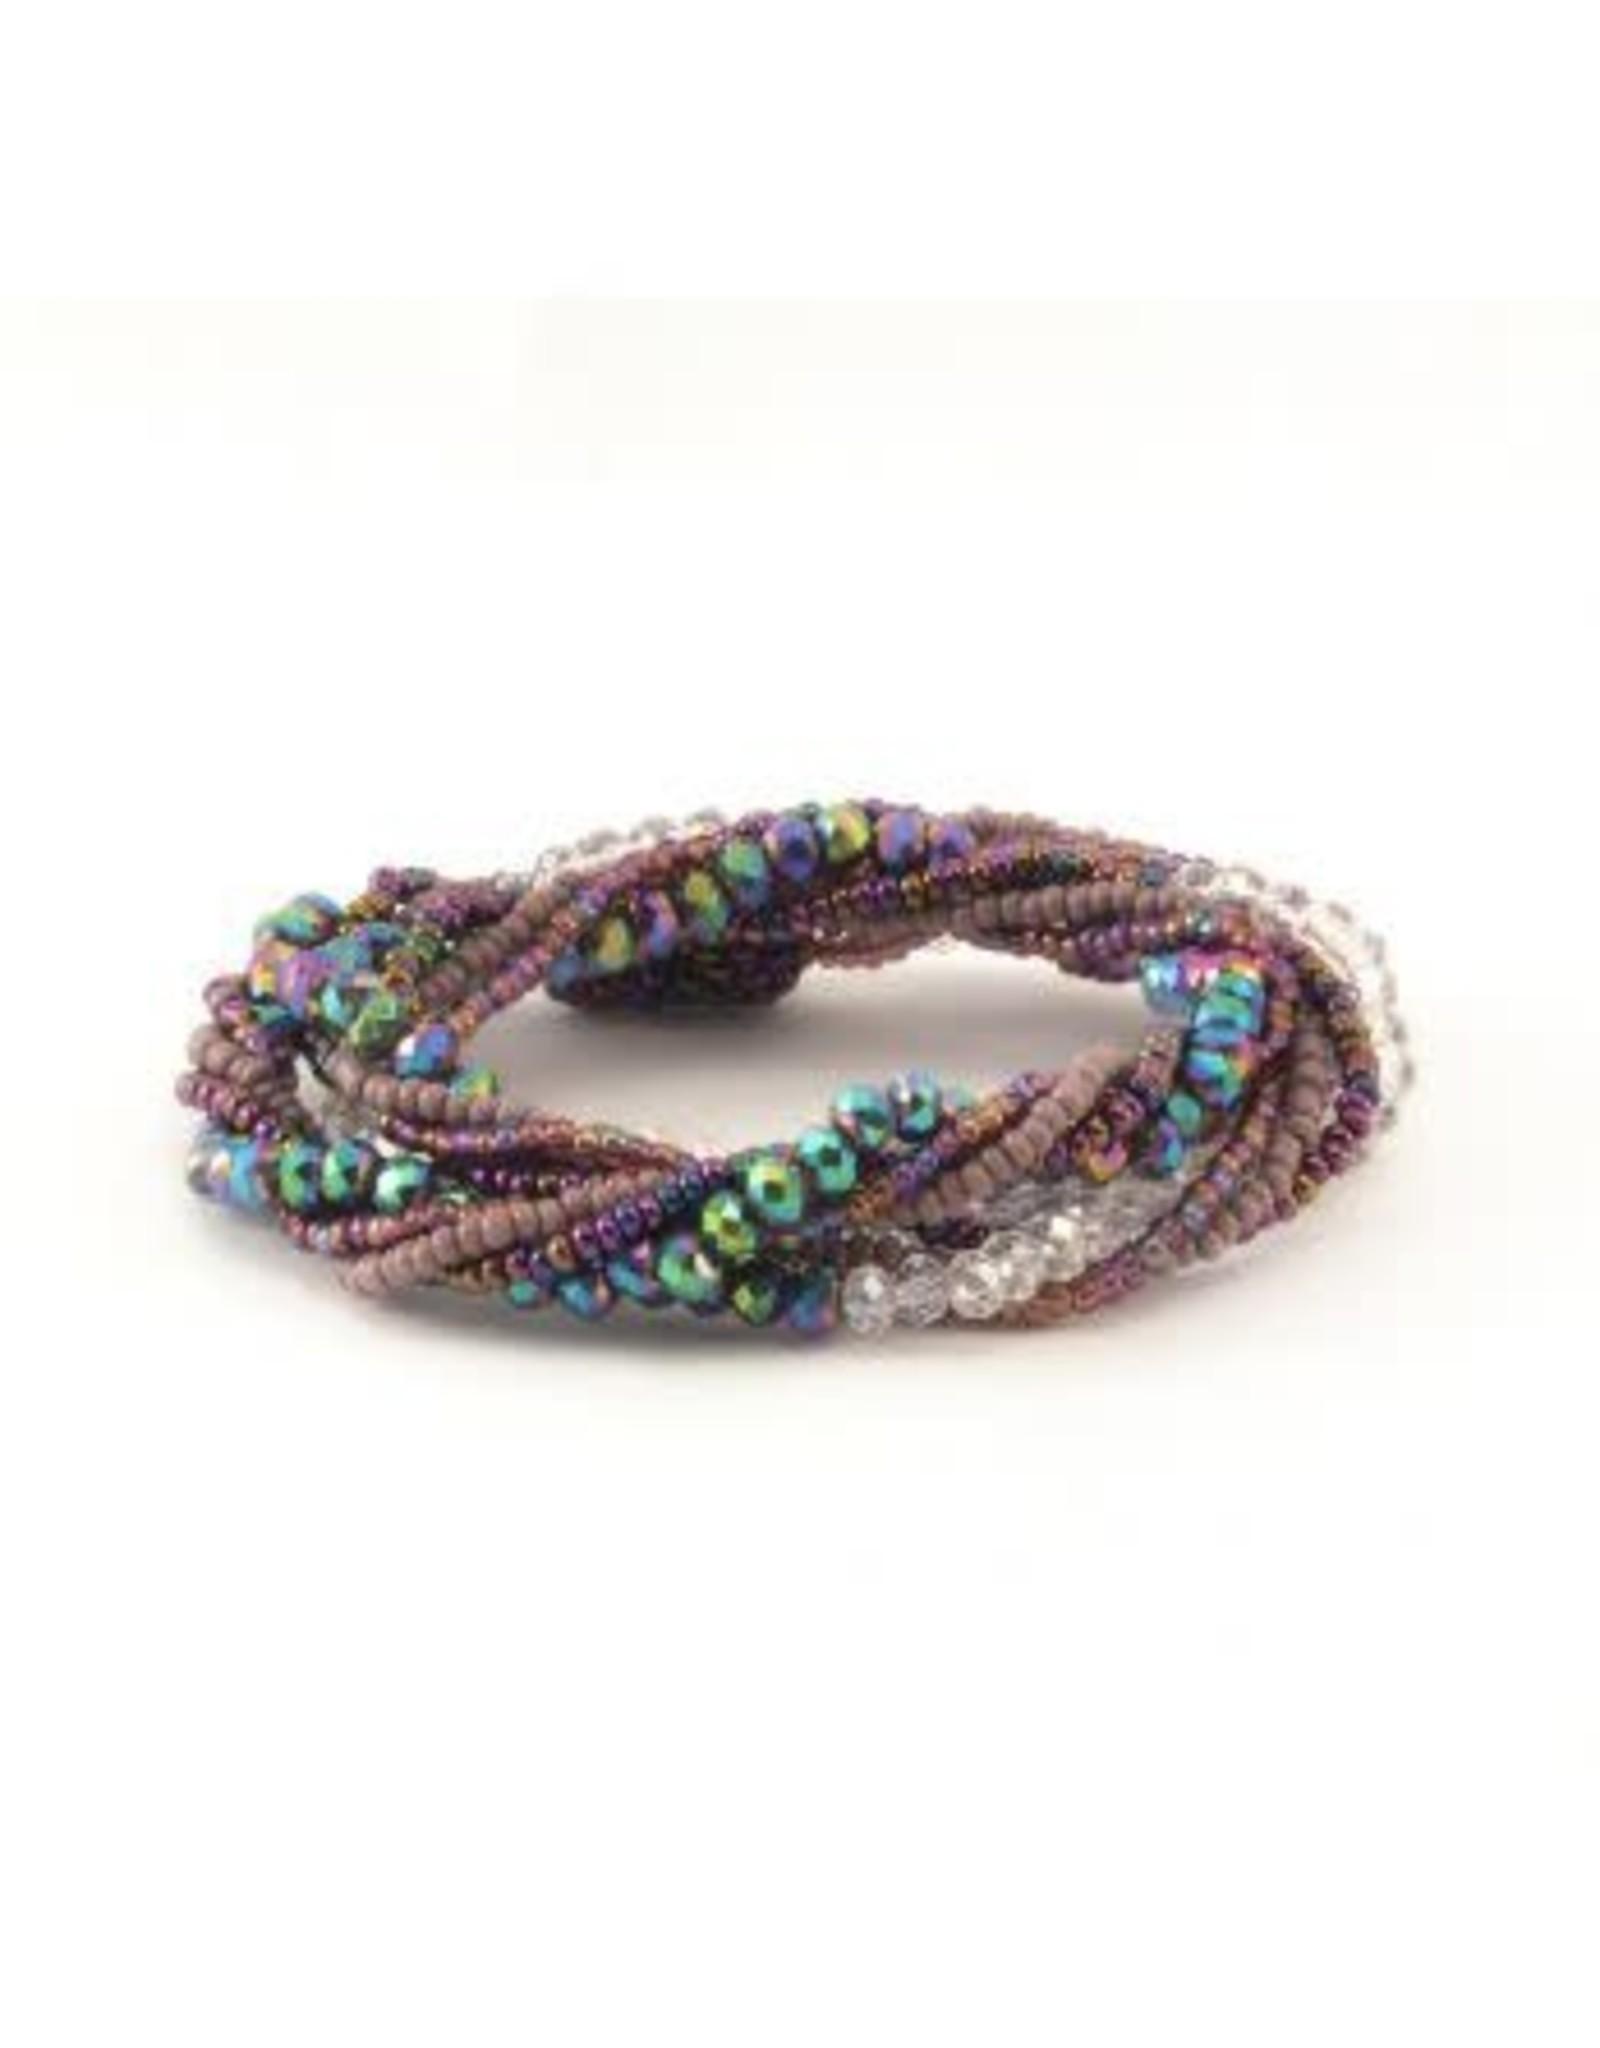 Magnetic Crystal Wrap Bracelet or Necklace, Guatemala